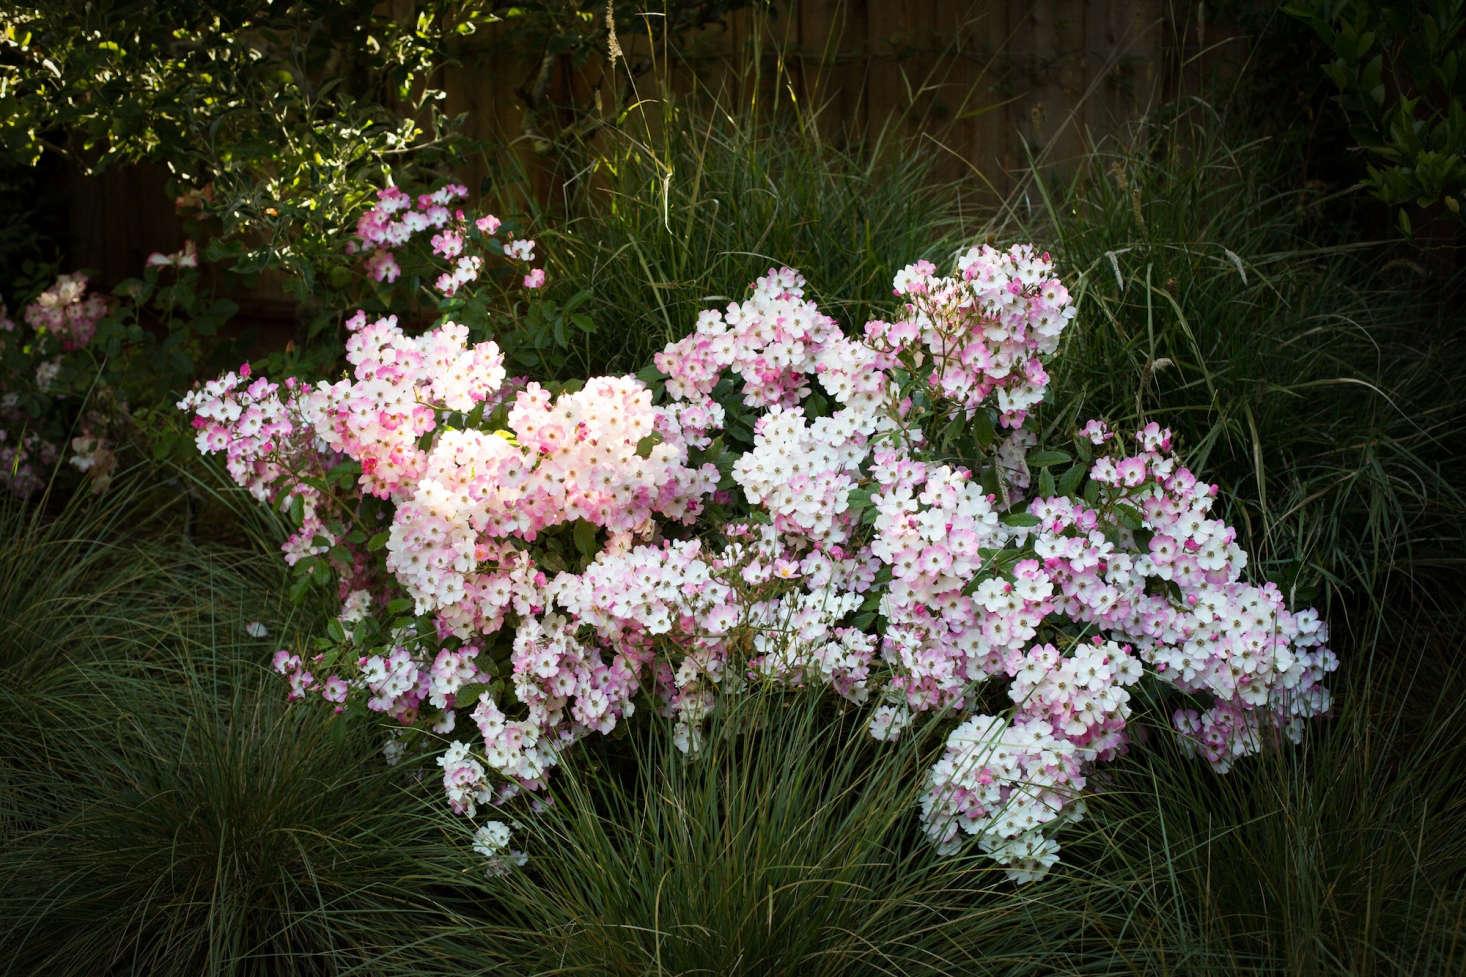 Zephirine Drouhin Climbing Rose the 7 best climbing roses for your garden - gardenista